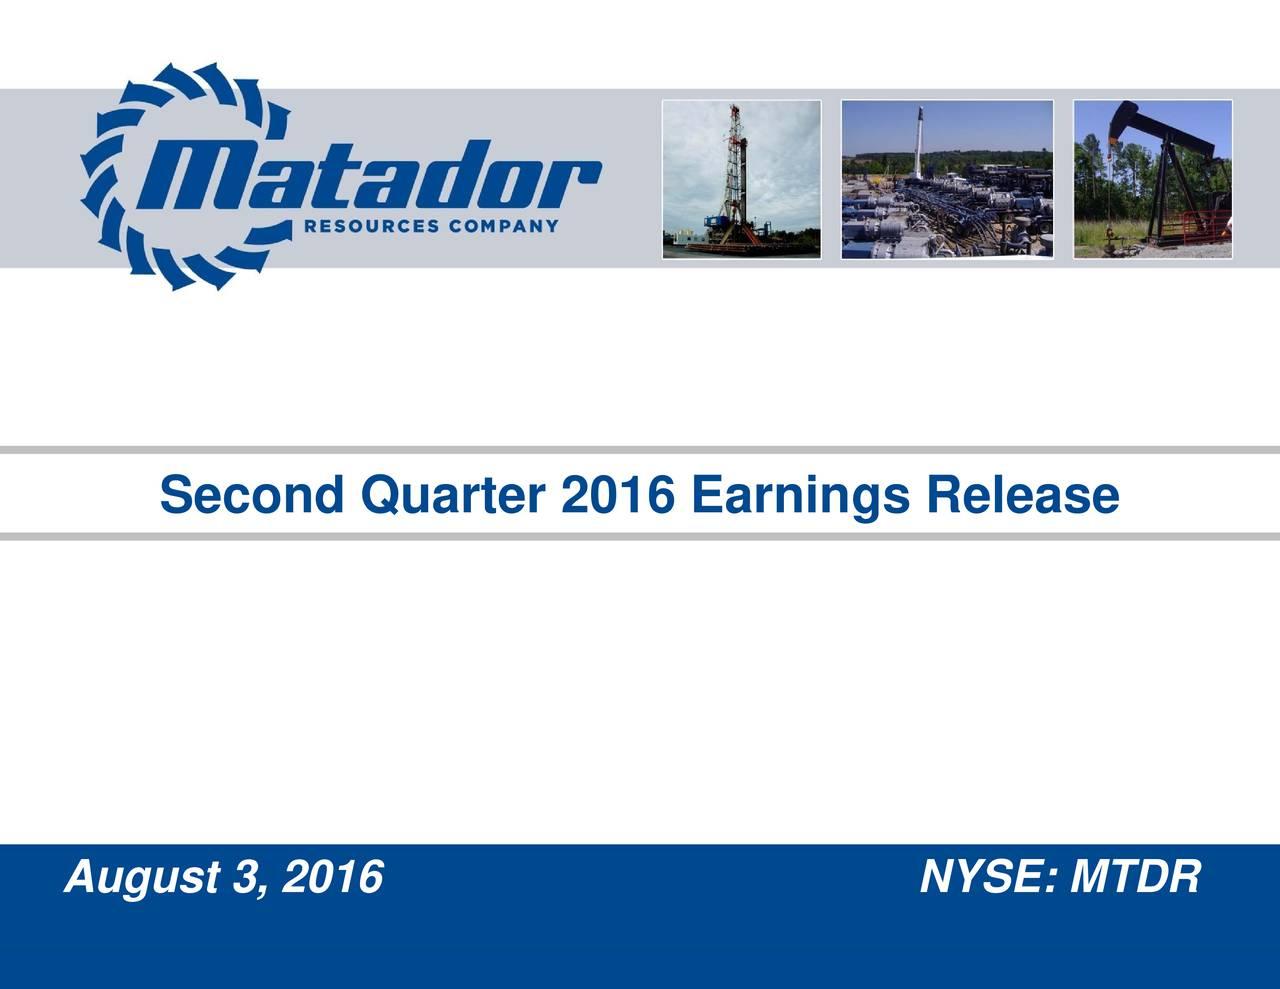 Second Quarter 2016 Earnings Release August 3, 2016